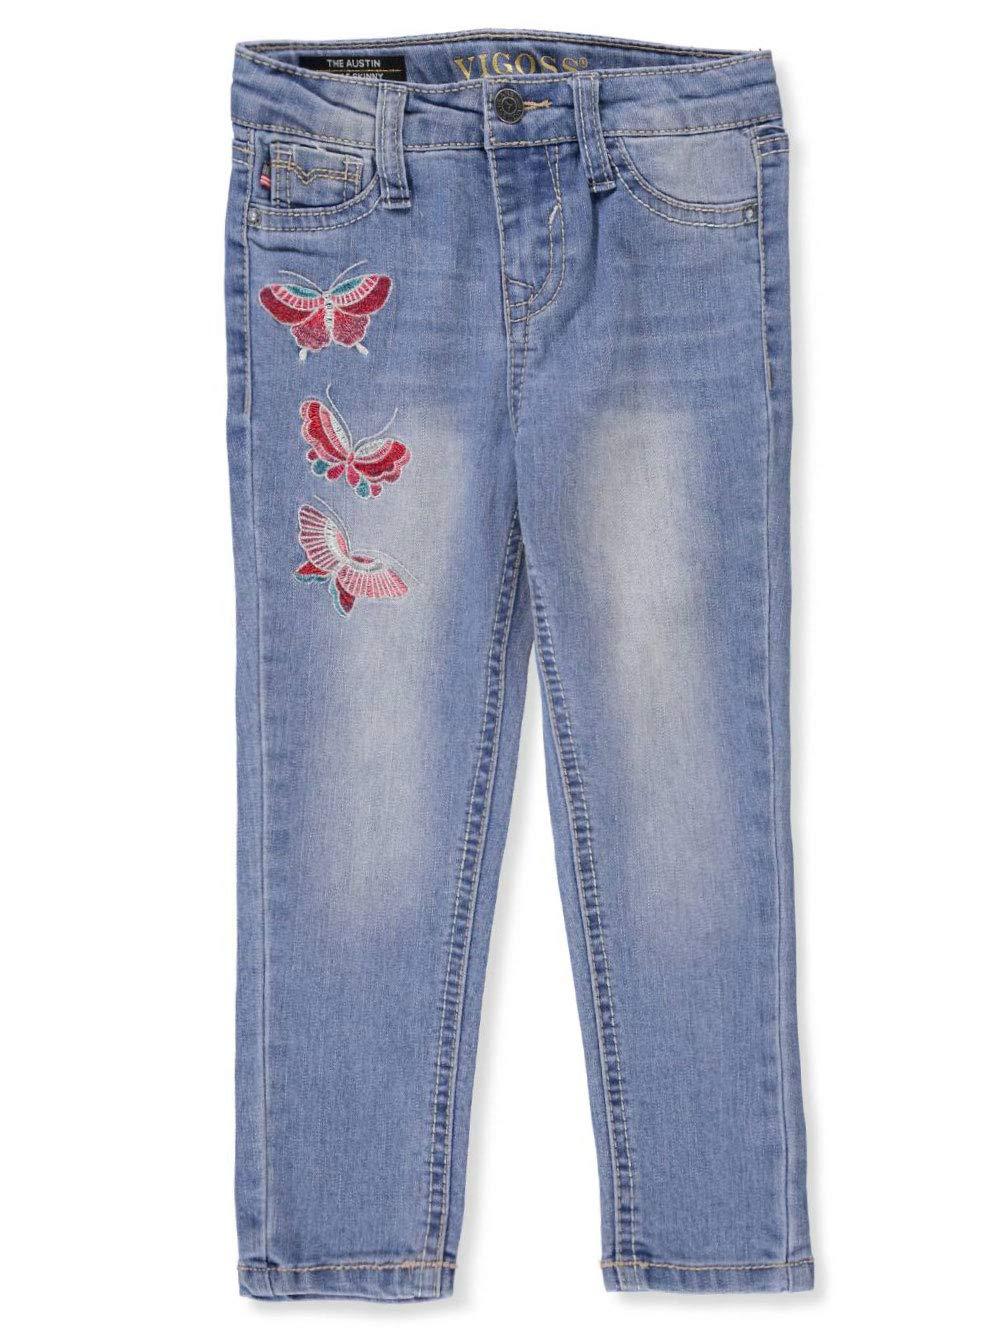 VIGOSS Girls' Toddler Fashion Jean, Butterfly Gulf Blue, 4T